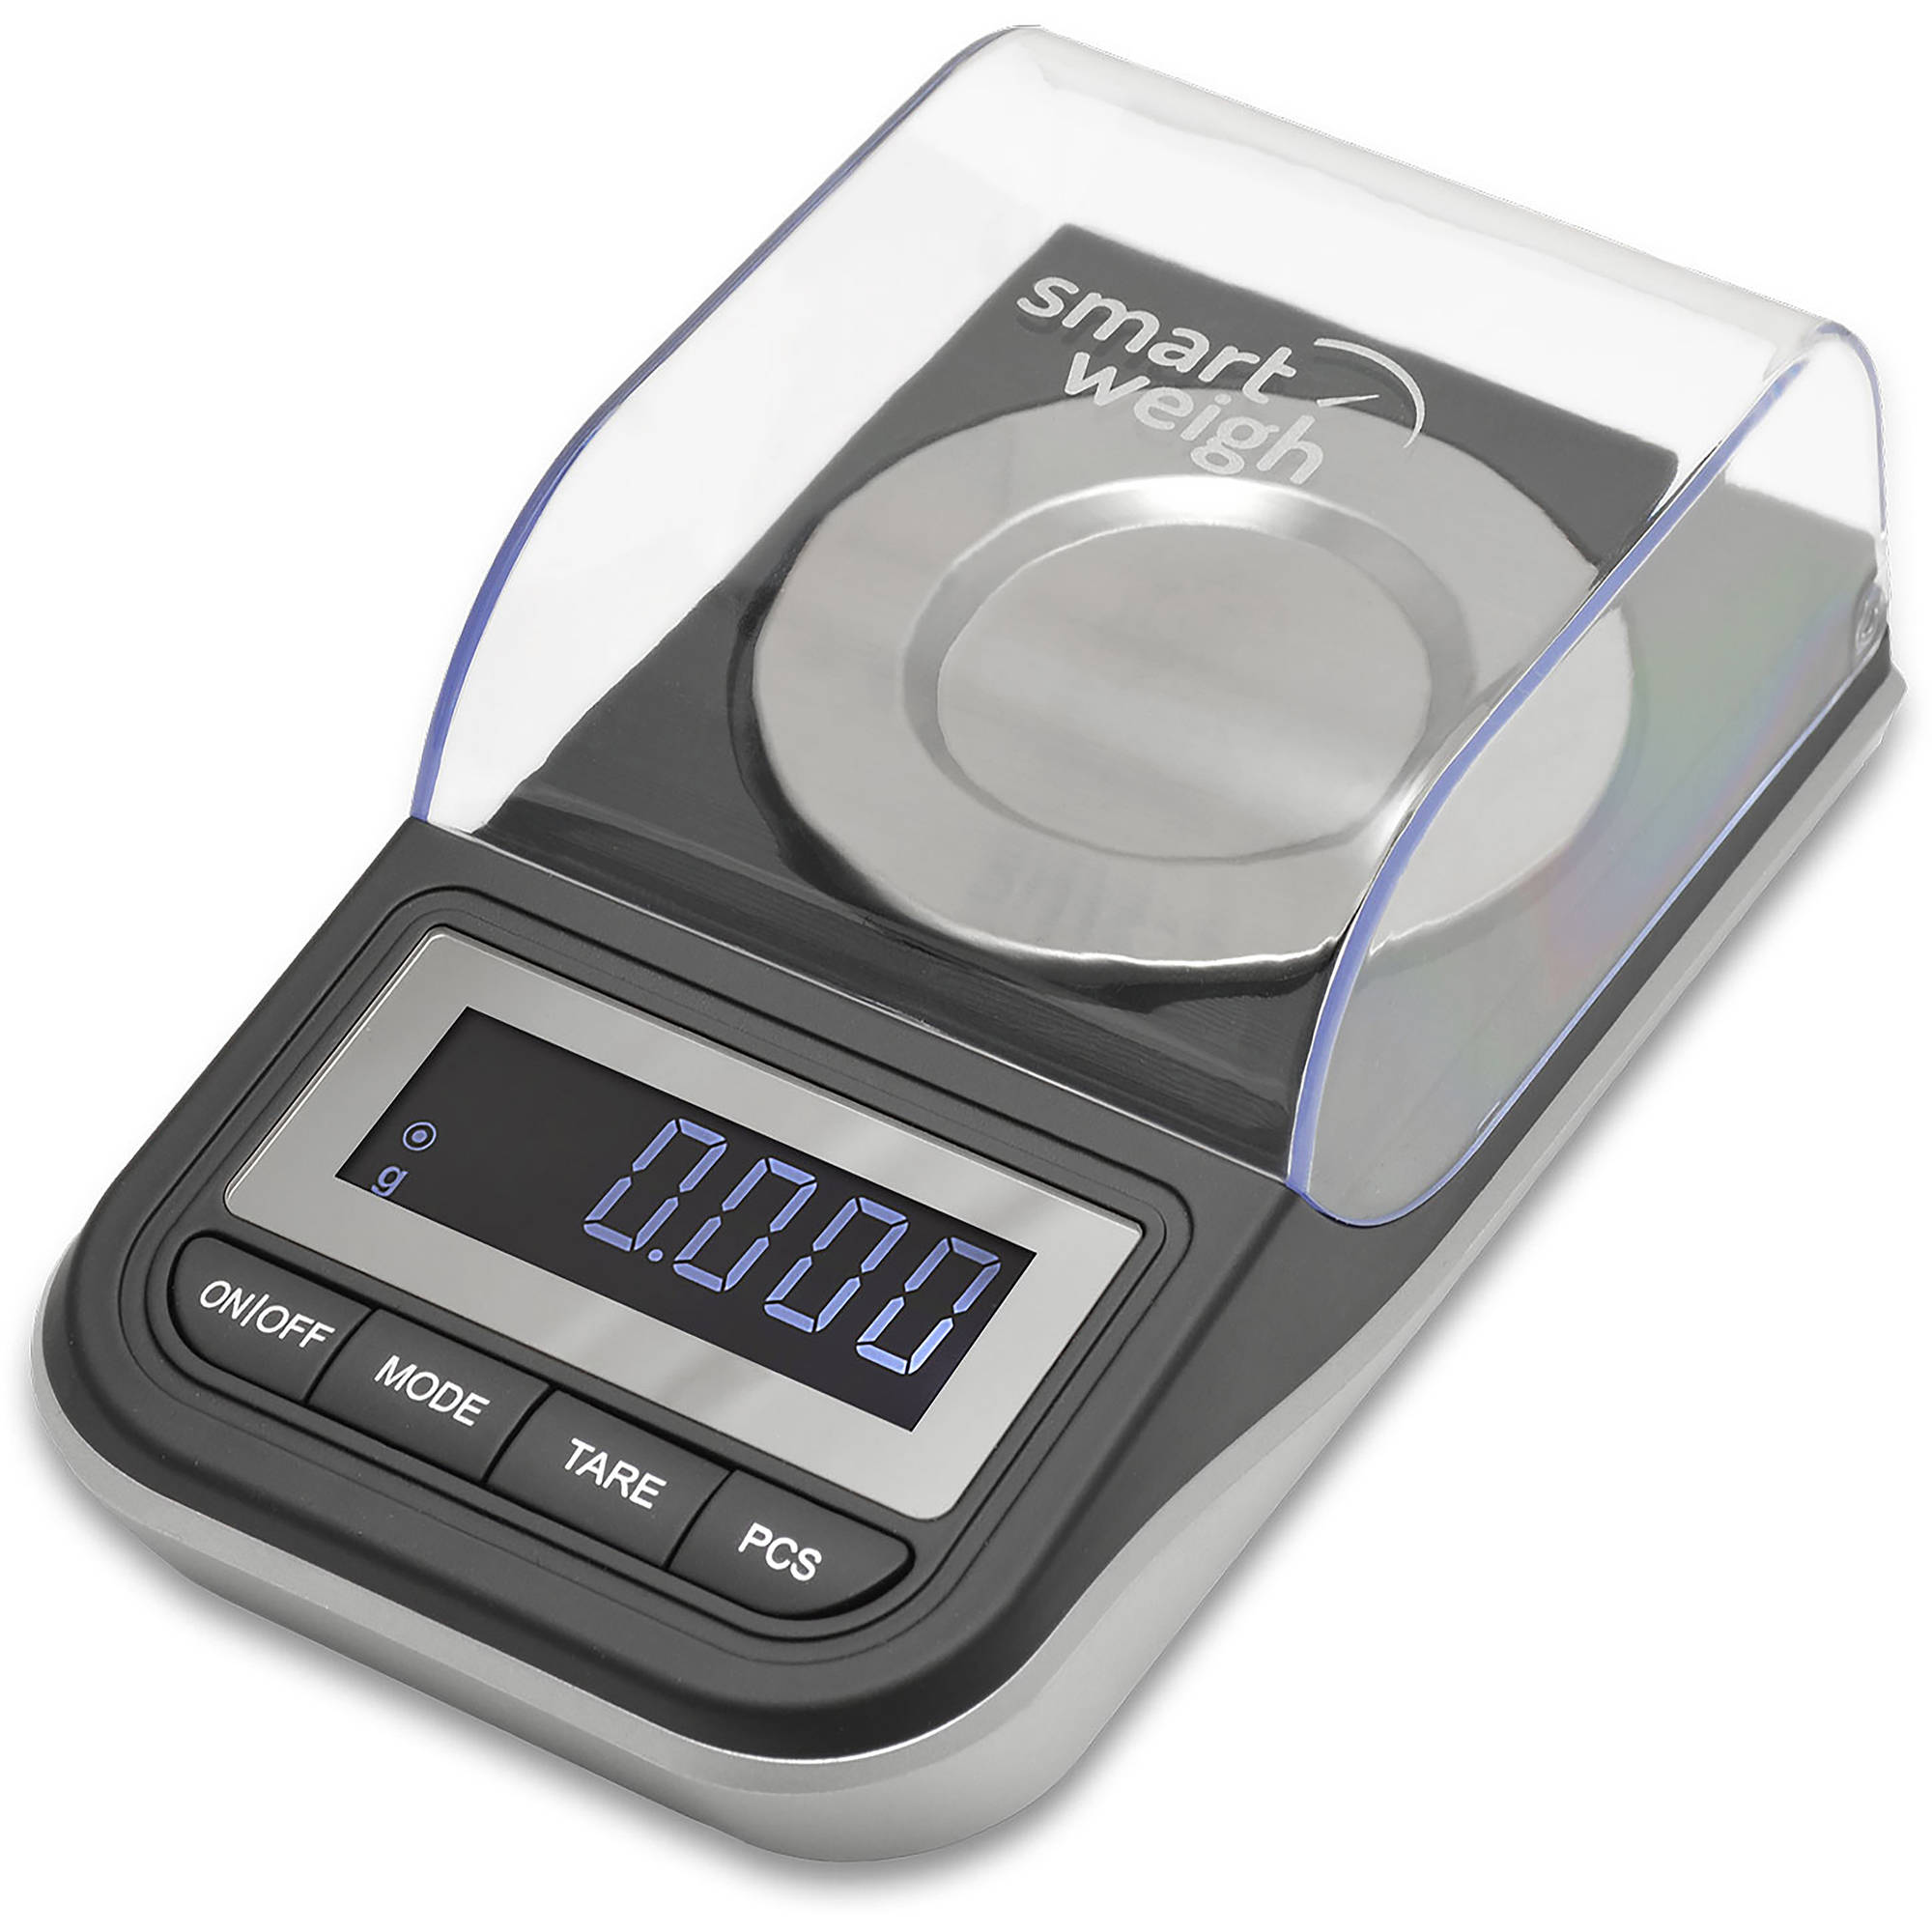 f0372f363d16 Smart Weigh High-Precision Milligram Digital Scale, 50 x 0.01g, Black,  SW-GEM50